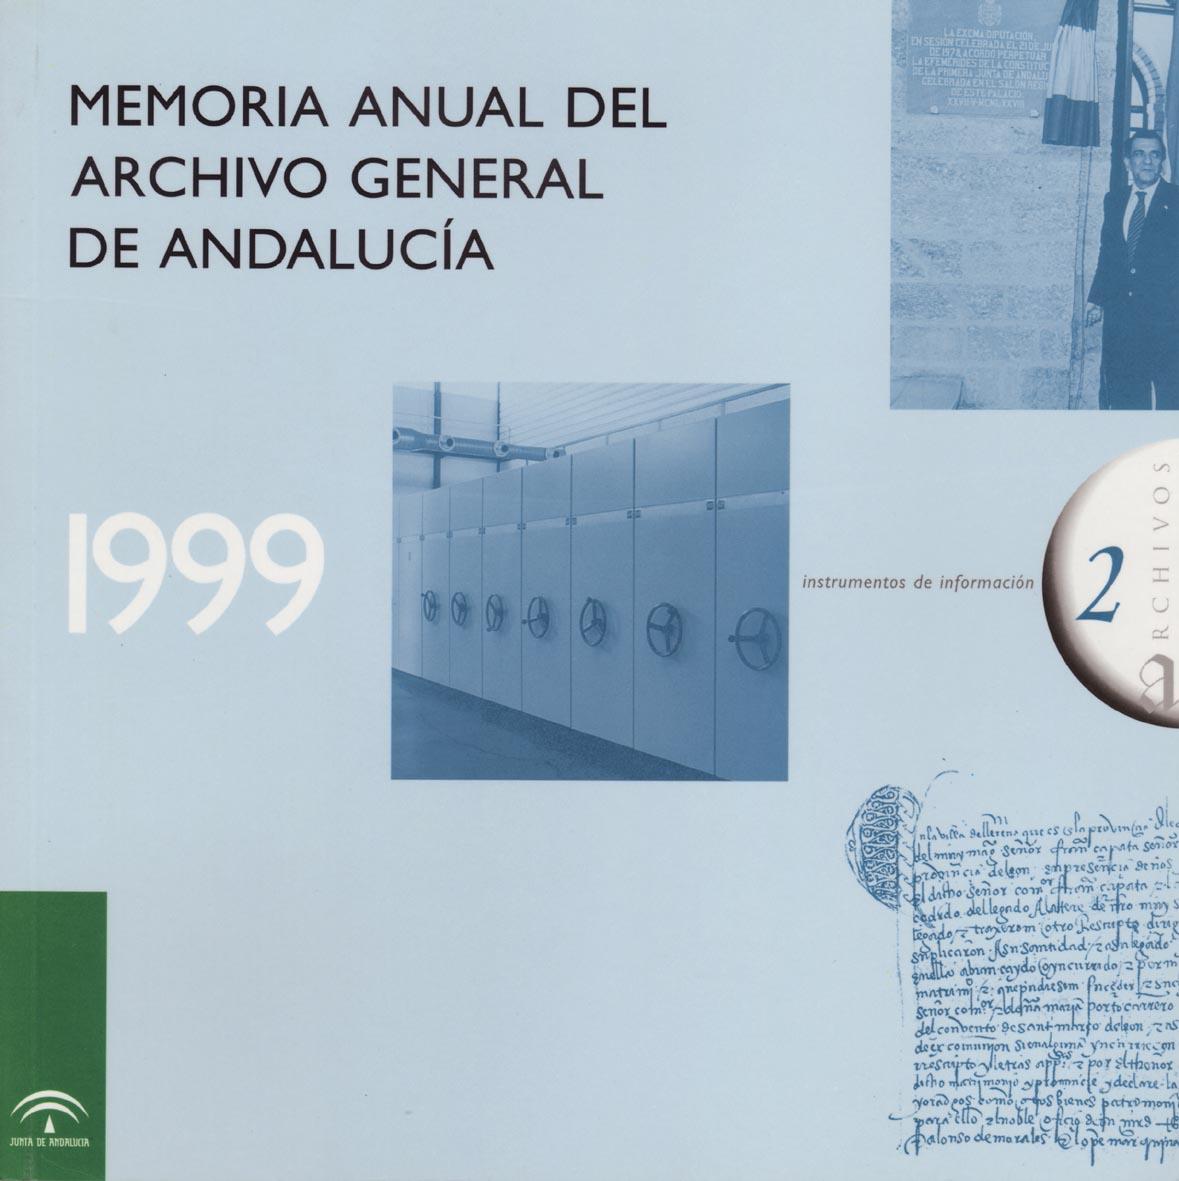 Archivo General de Andalucía.Memoria anual 1999